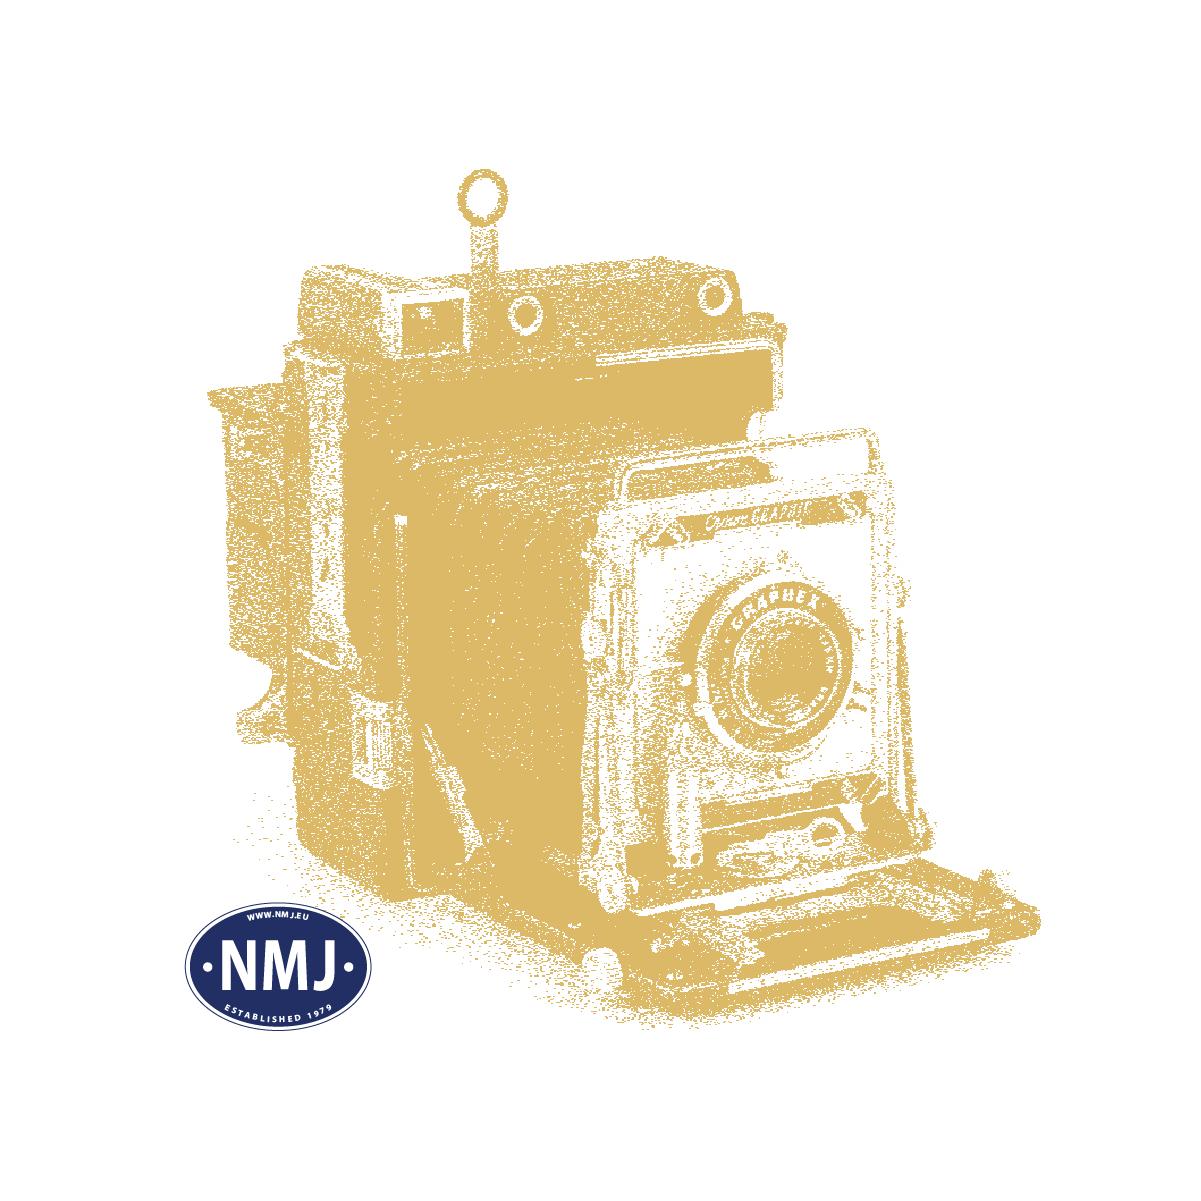 NMJT90020 - NMJ Topline NSB Di3a 626 Nydesign, DC